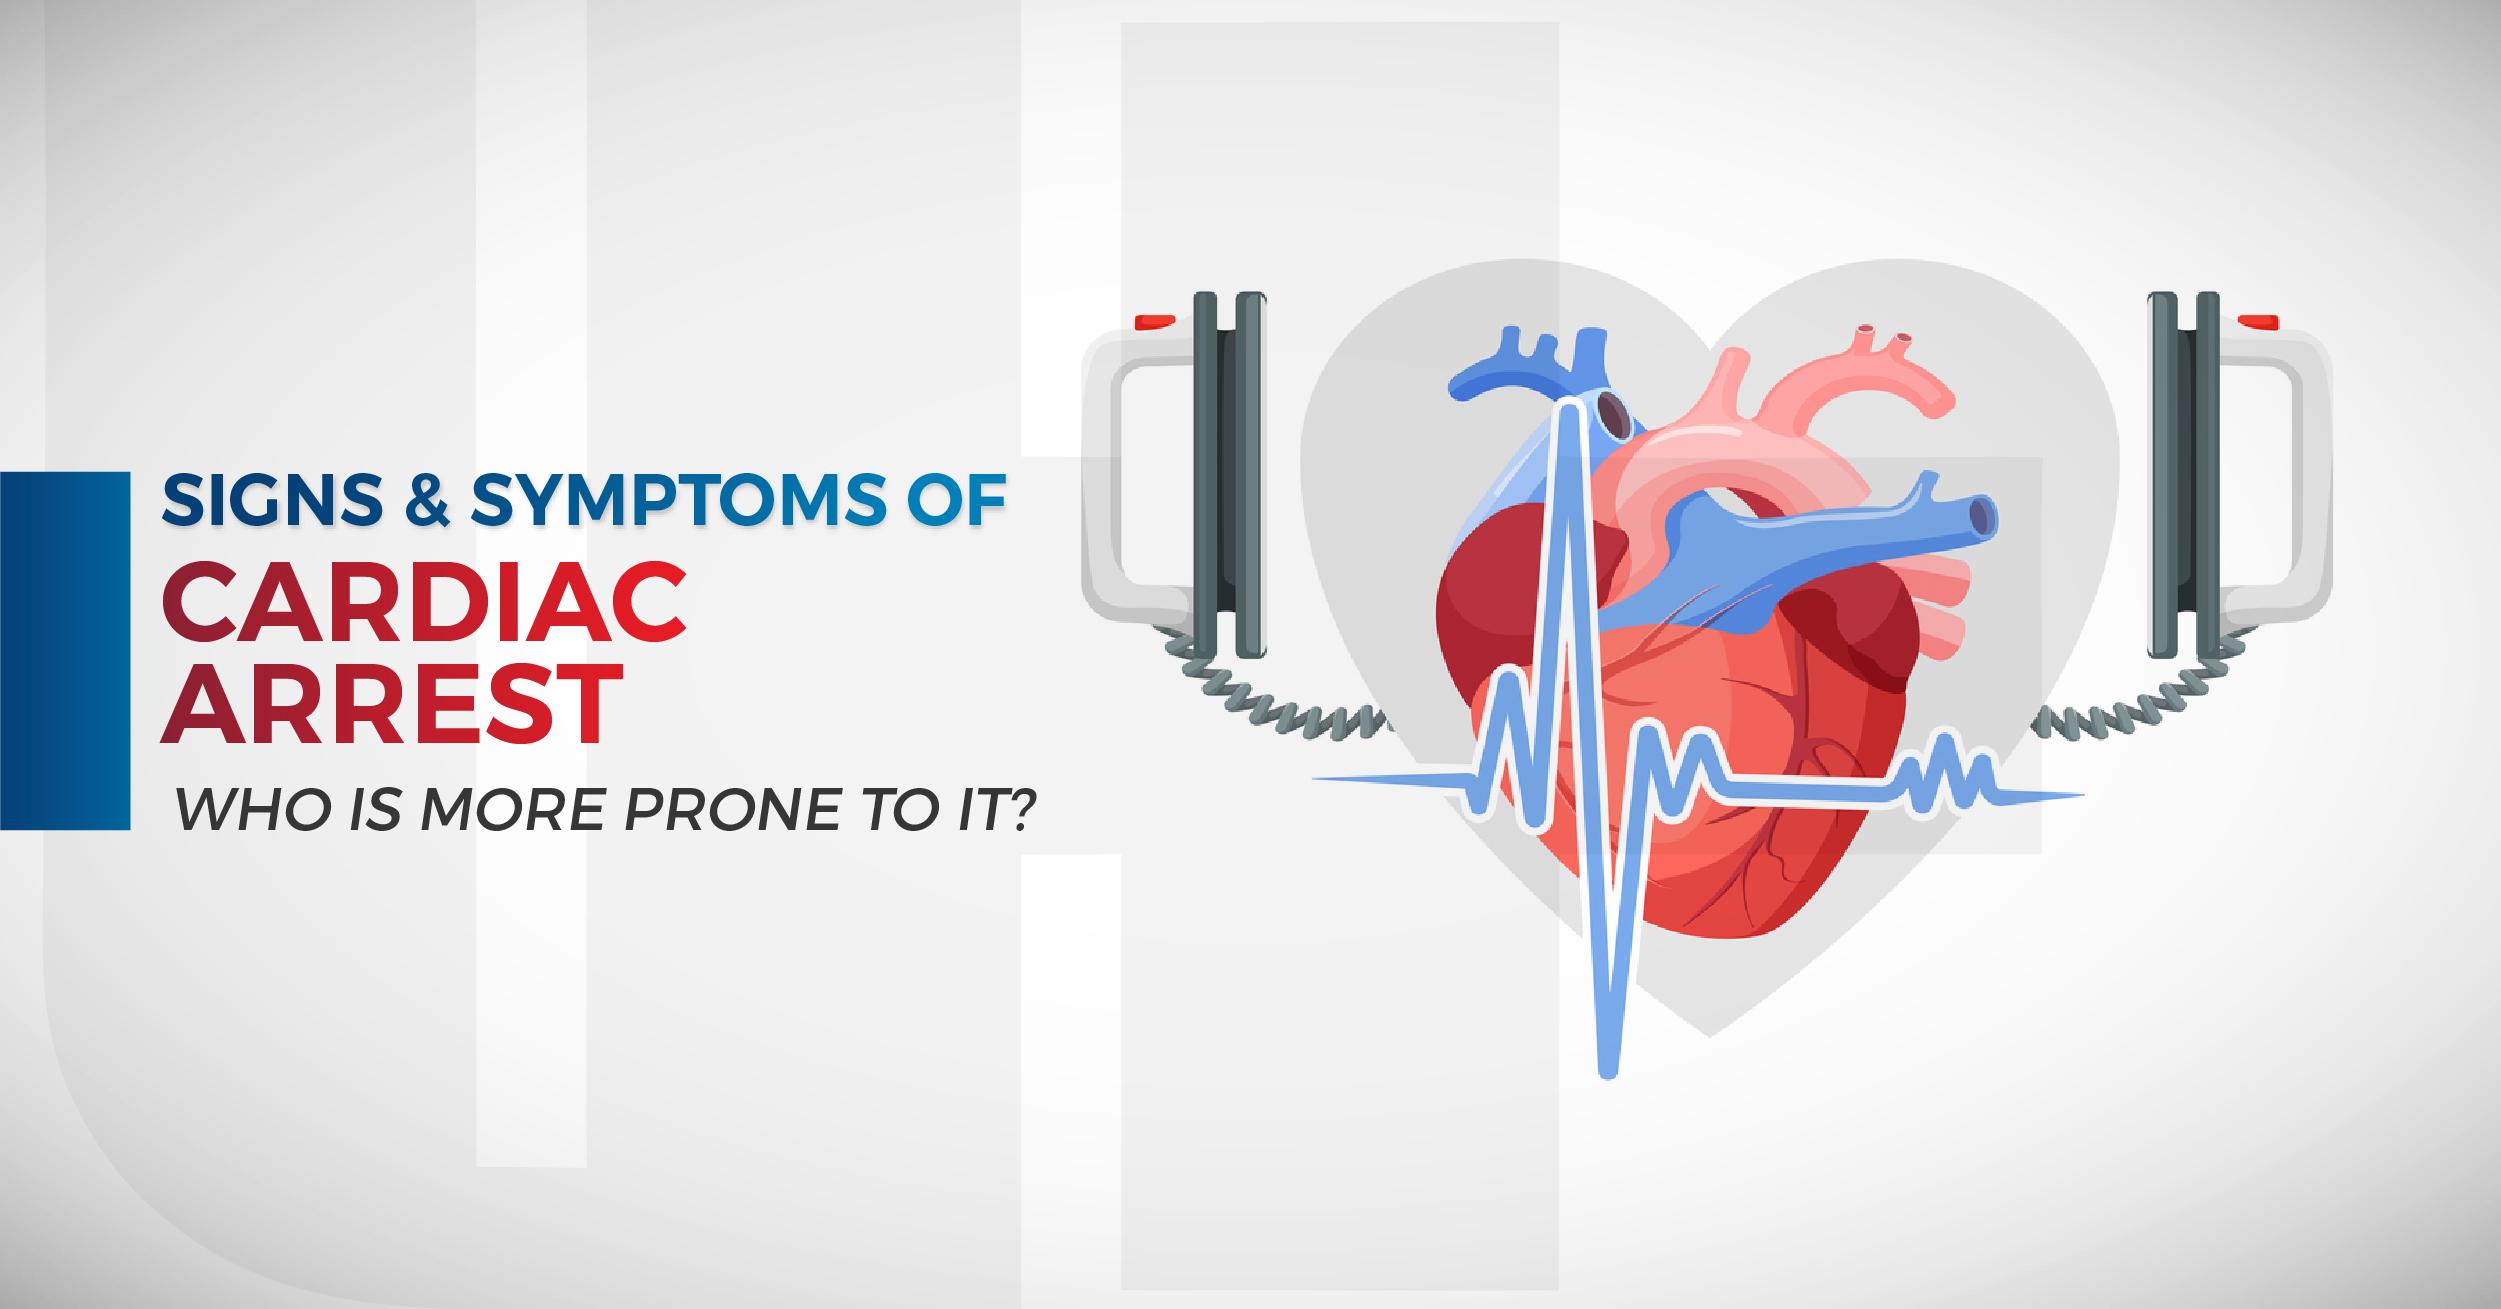 Signs & Symptoms of Cardiac Arrest